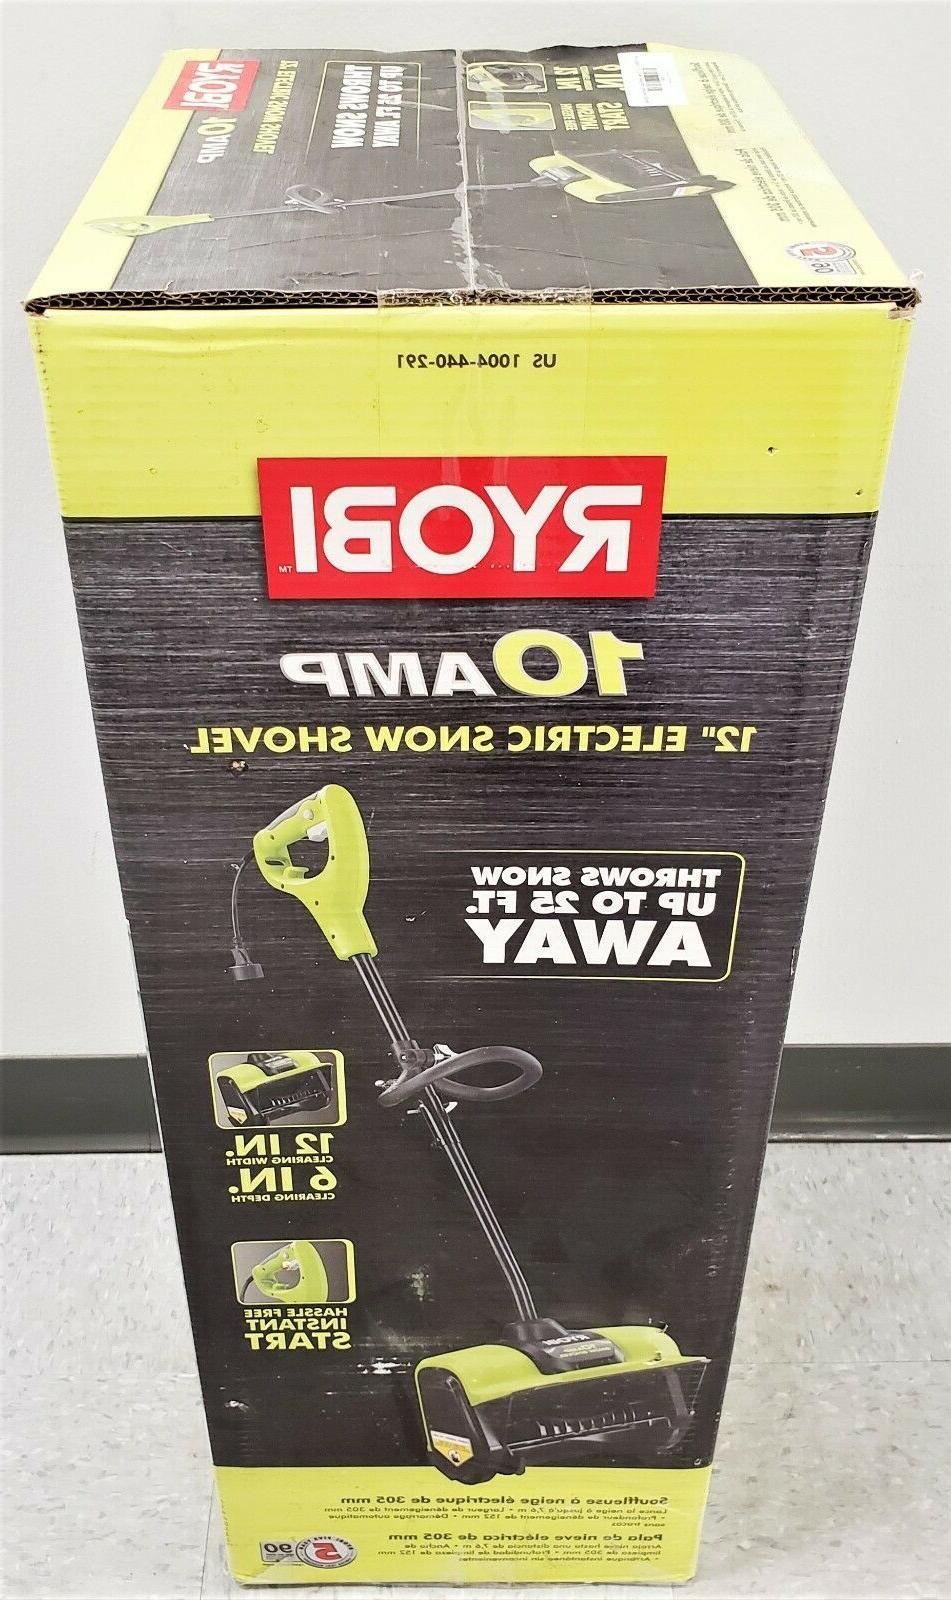 Ryobi RYAC804-S 12in. Amp Electric Blower Shovel